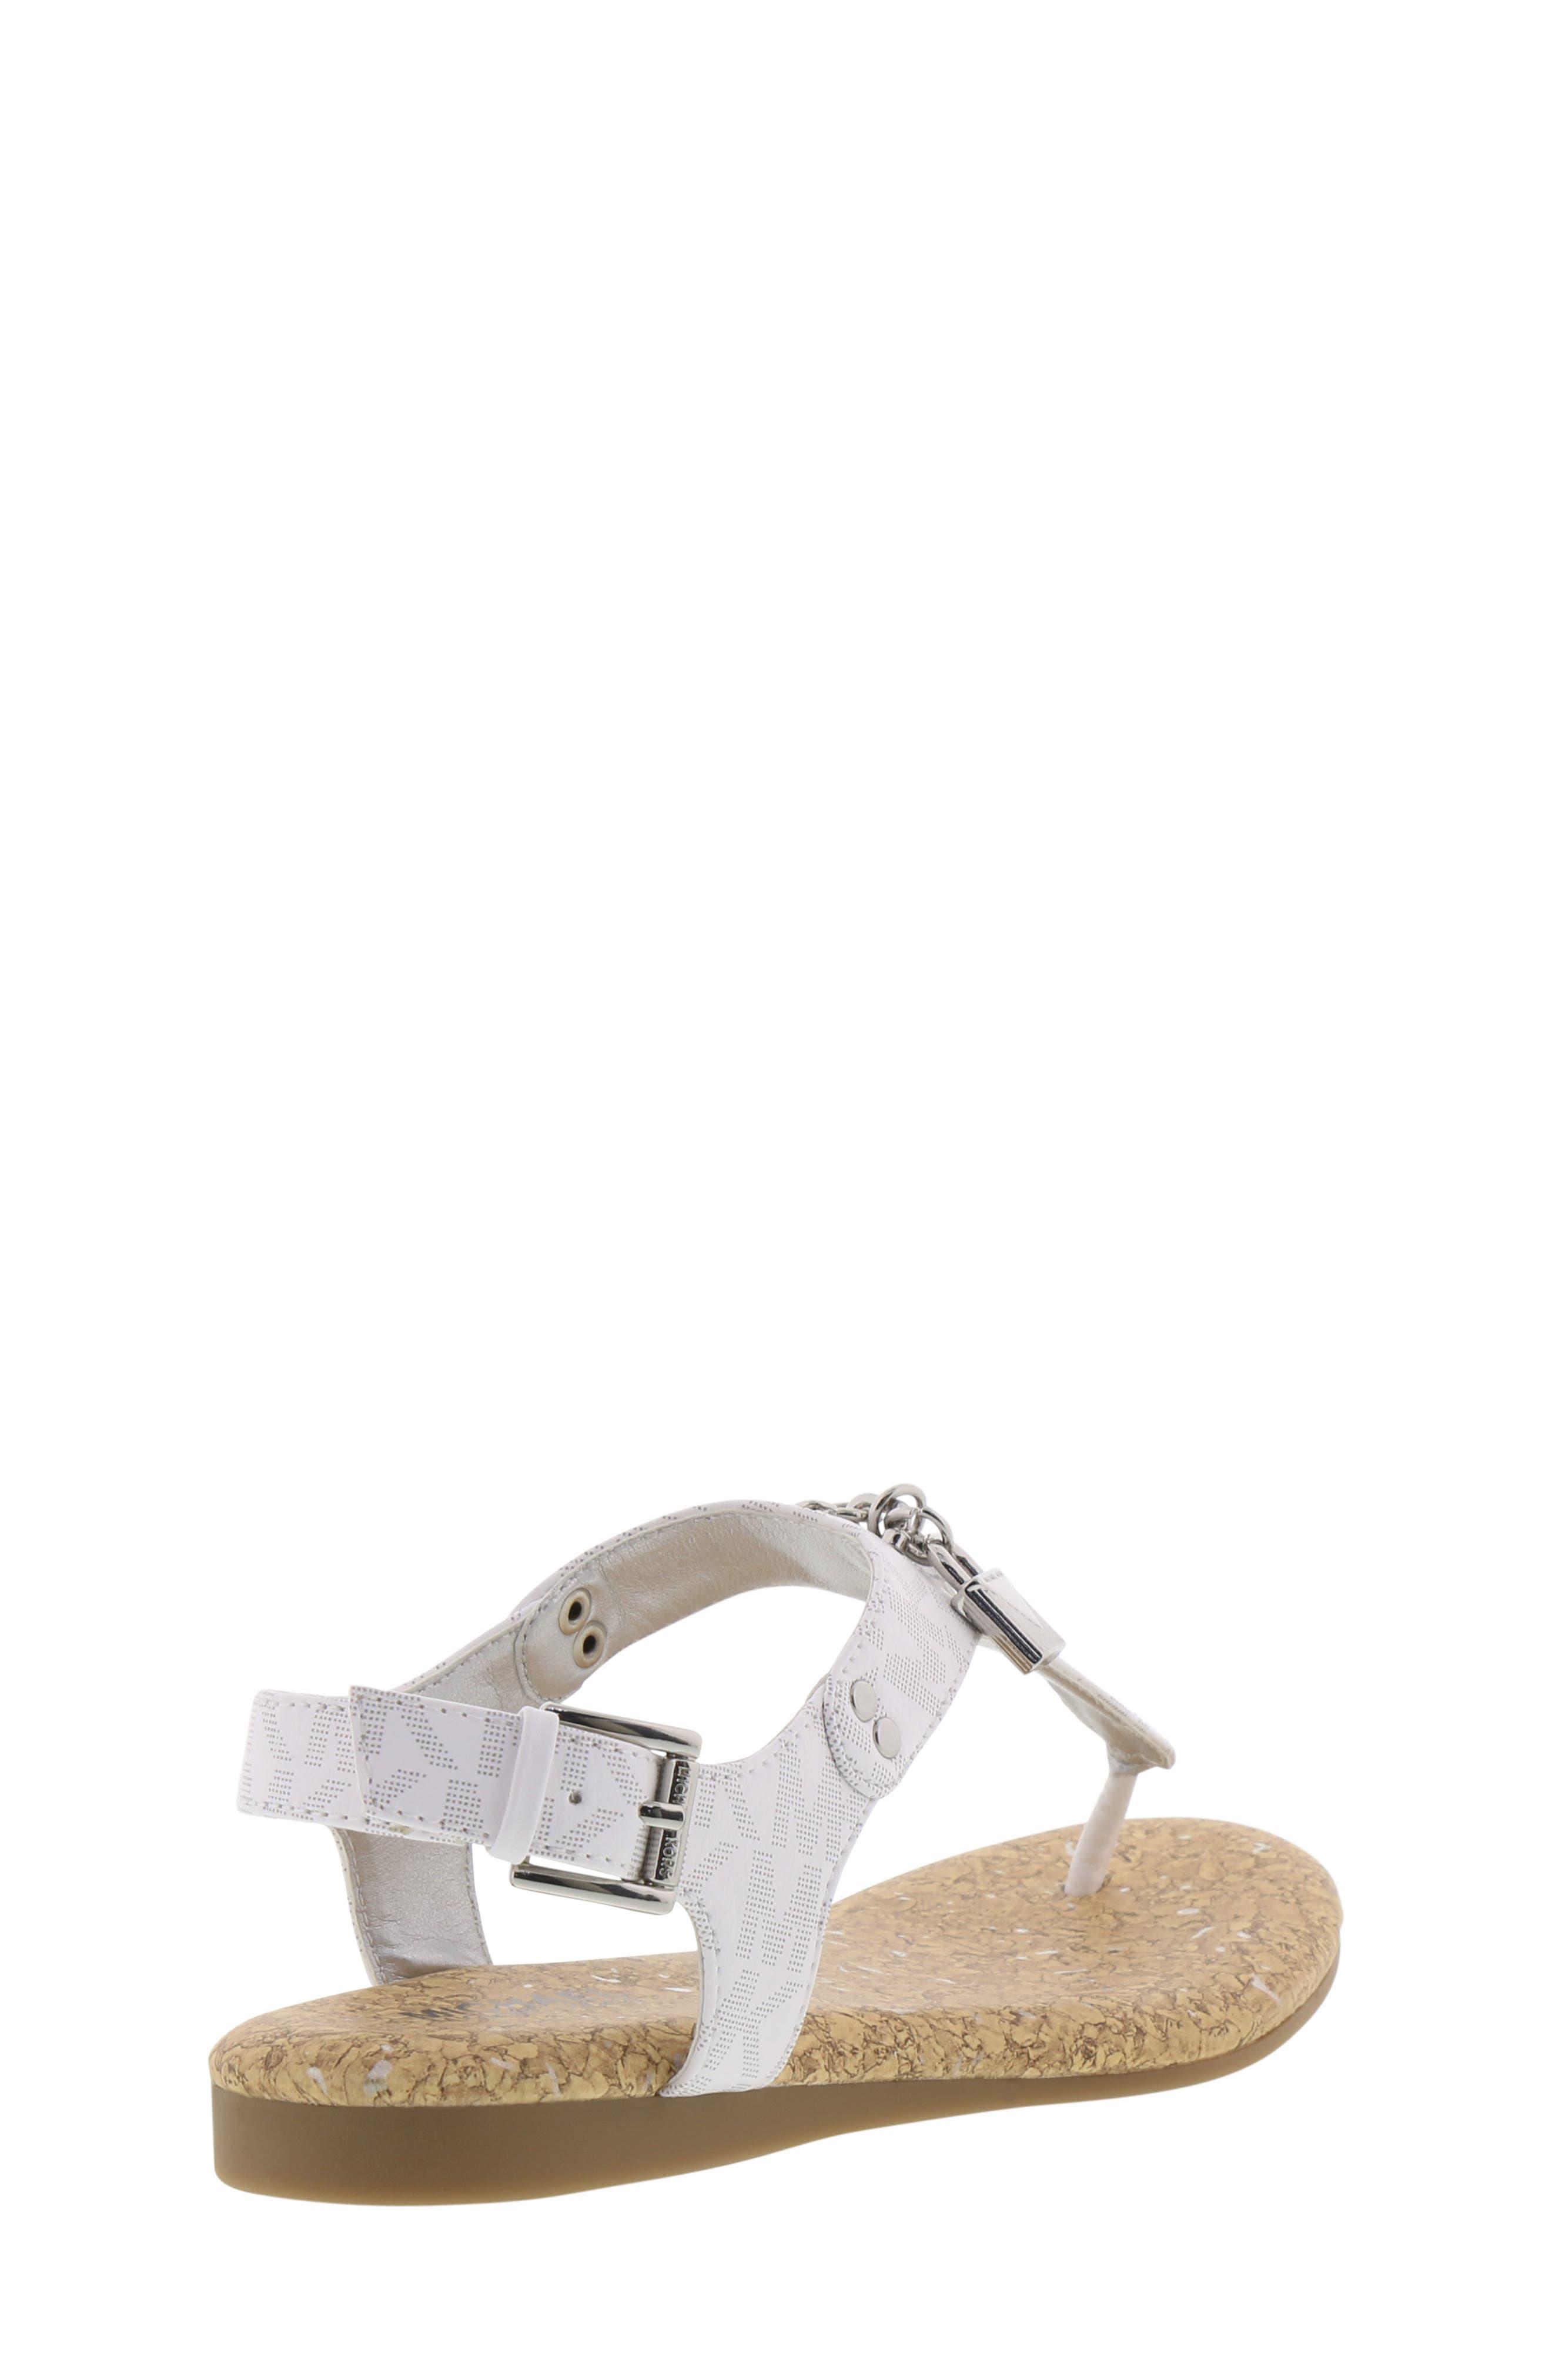 MICHAEL MICHAEL KORS, Tilly Cora Charm T-Strap Sandal, Alternate thumbnail 2, color, WHITE LOGO